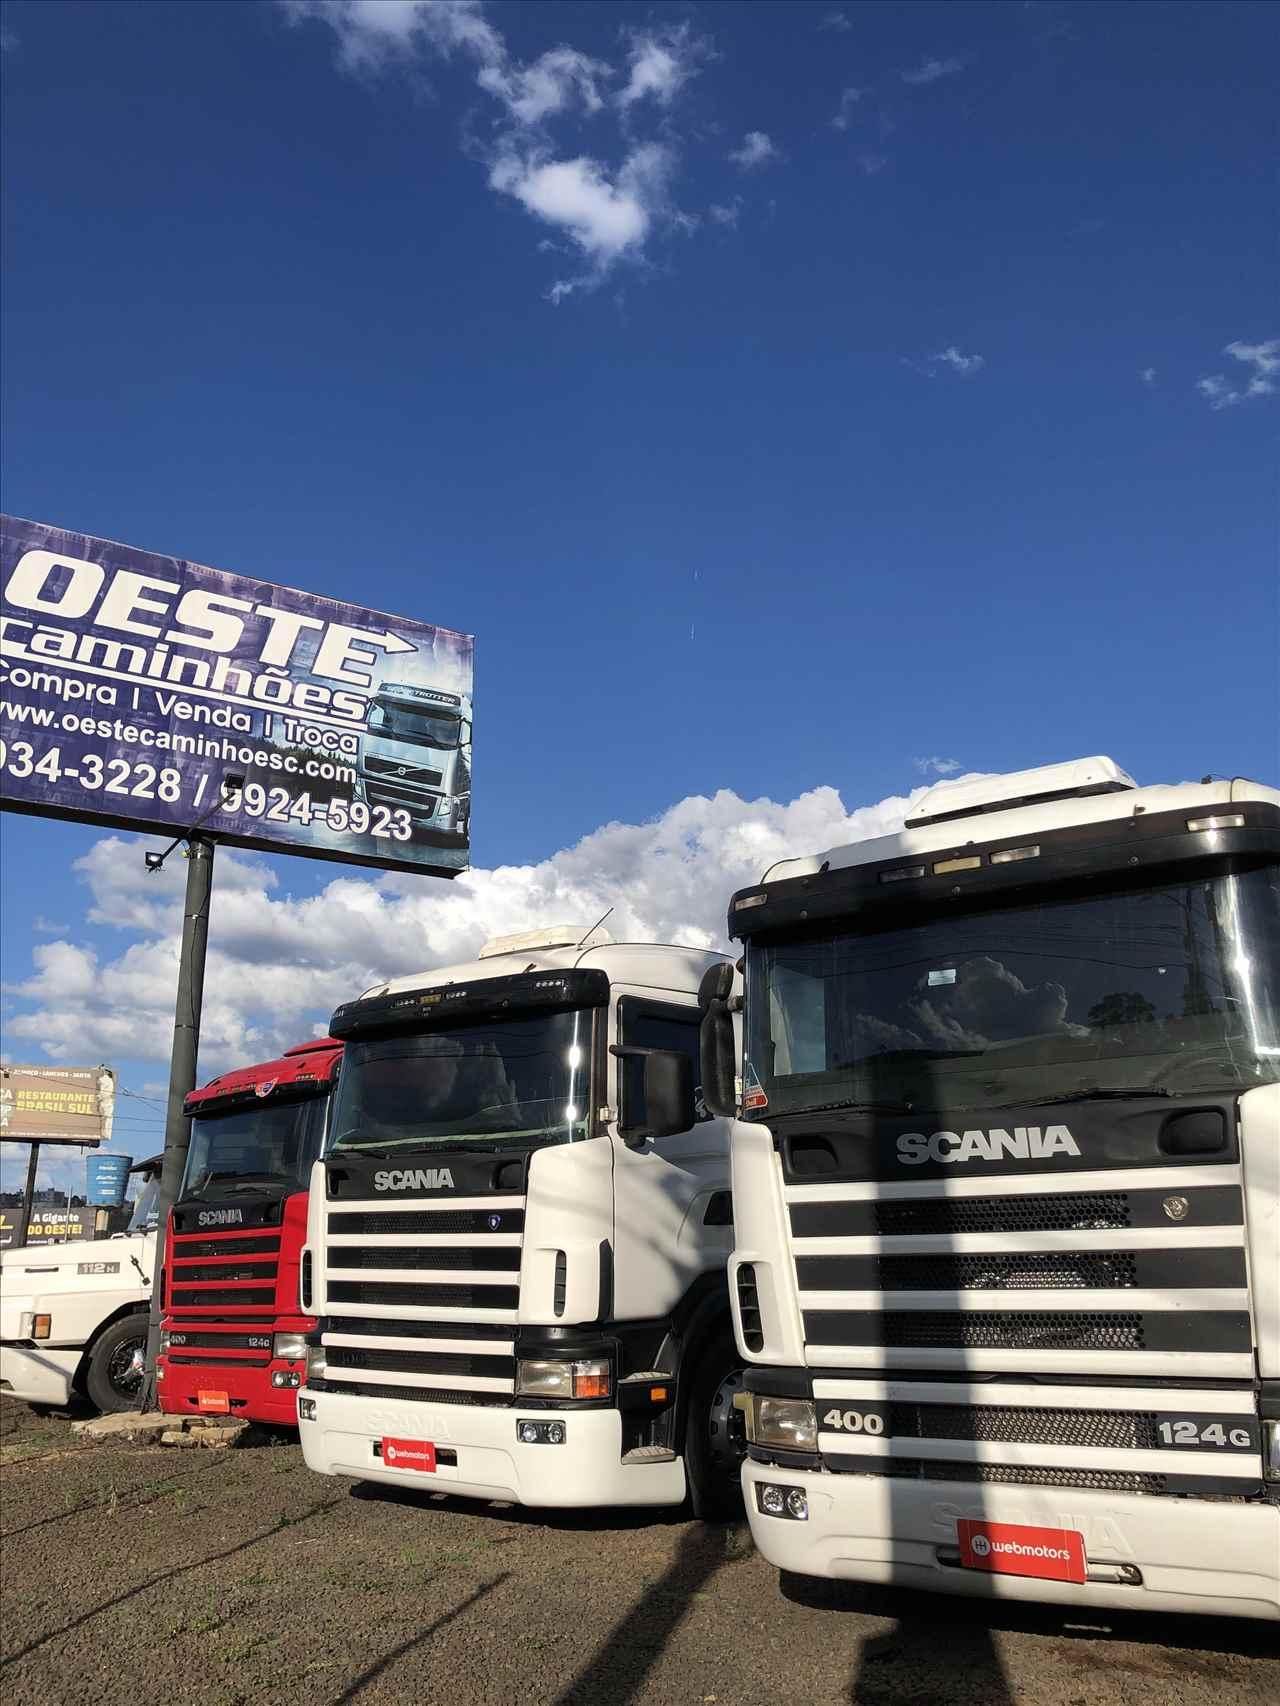 Foto da Loja da Oeste Caminhões